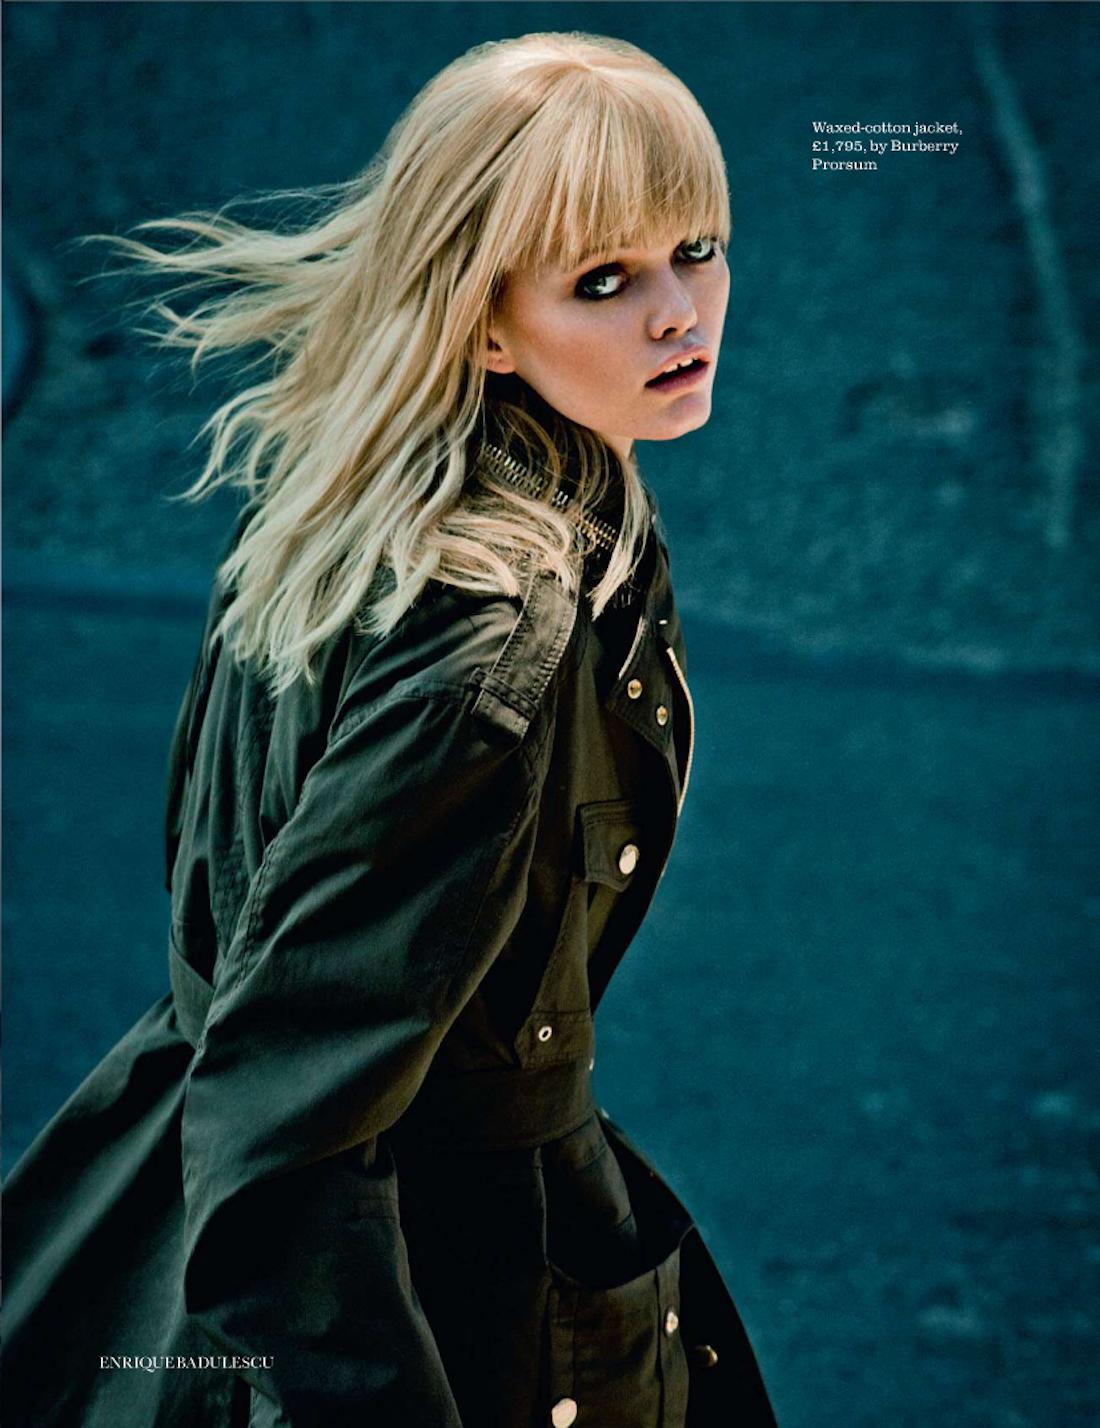 'Call of Duty' Jennifer Pugh by Enrique Badulescu for UK Elle October 2012